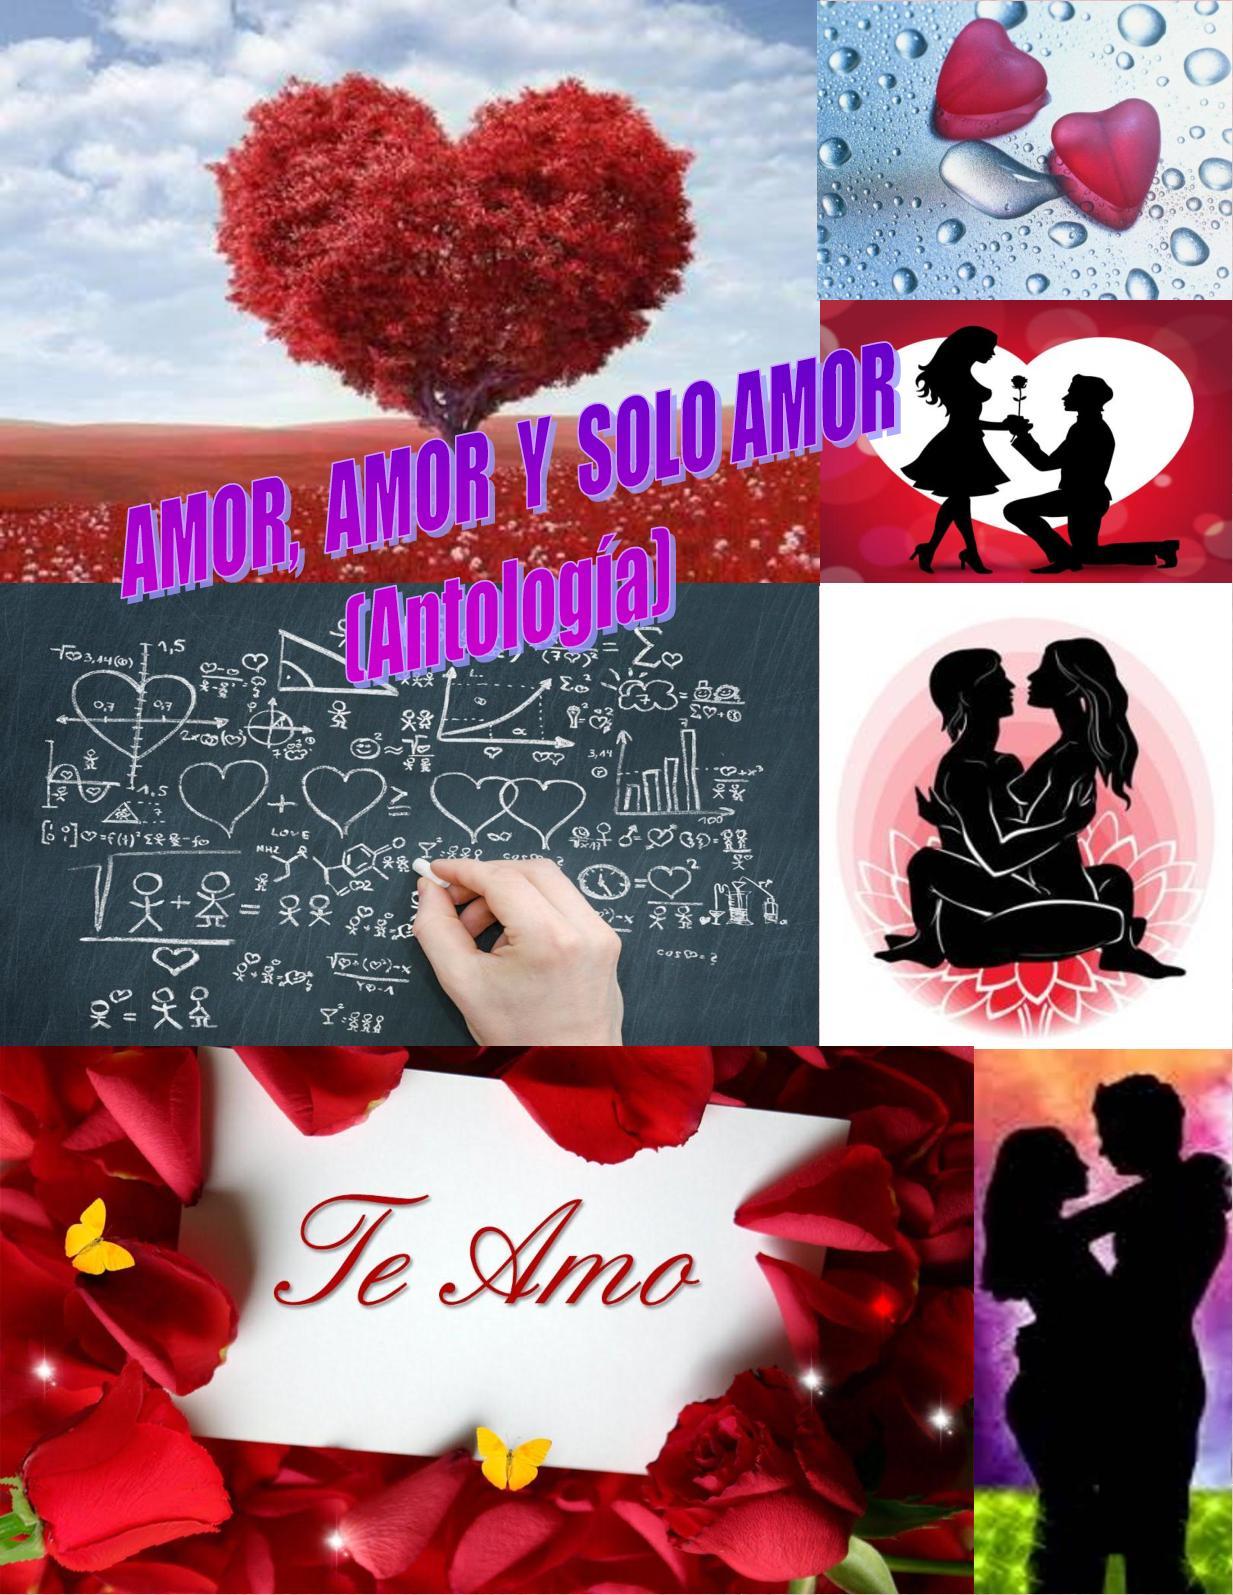 22e2860544 Calaméo - Amor